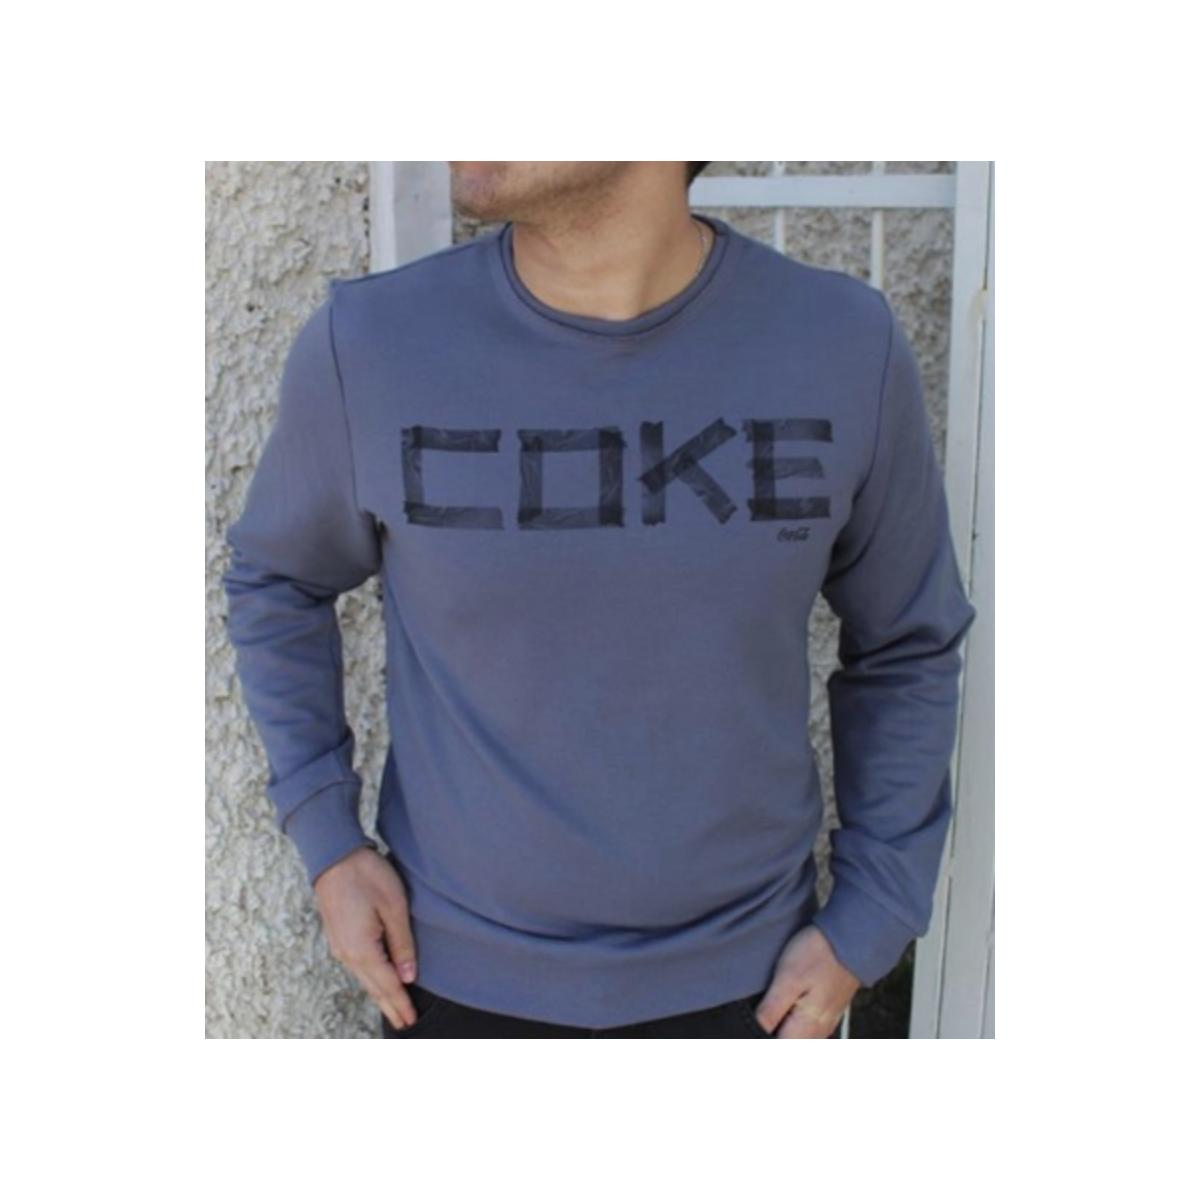 Blusão Masculino Coca-cola Clothing 413200334 Cinza